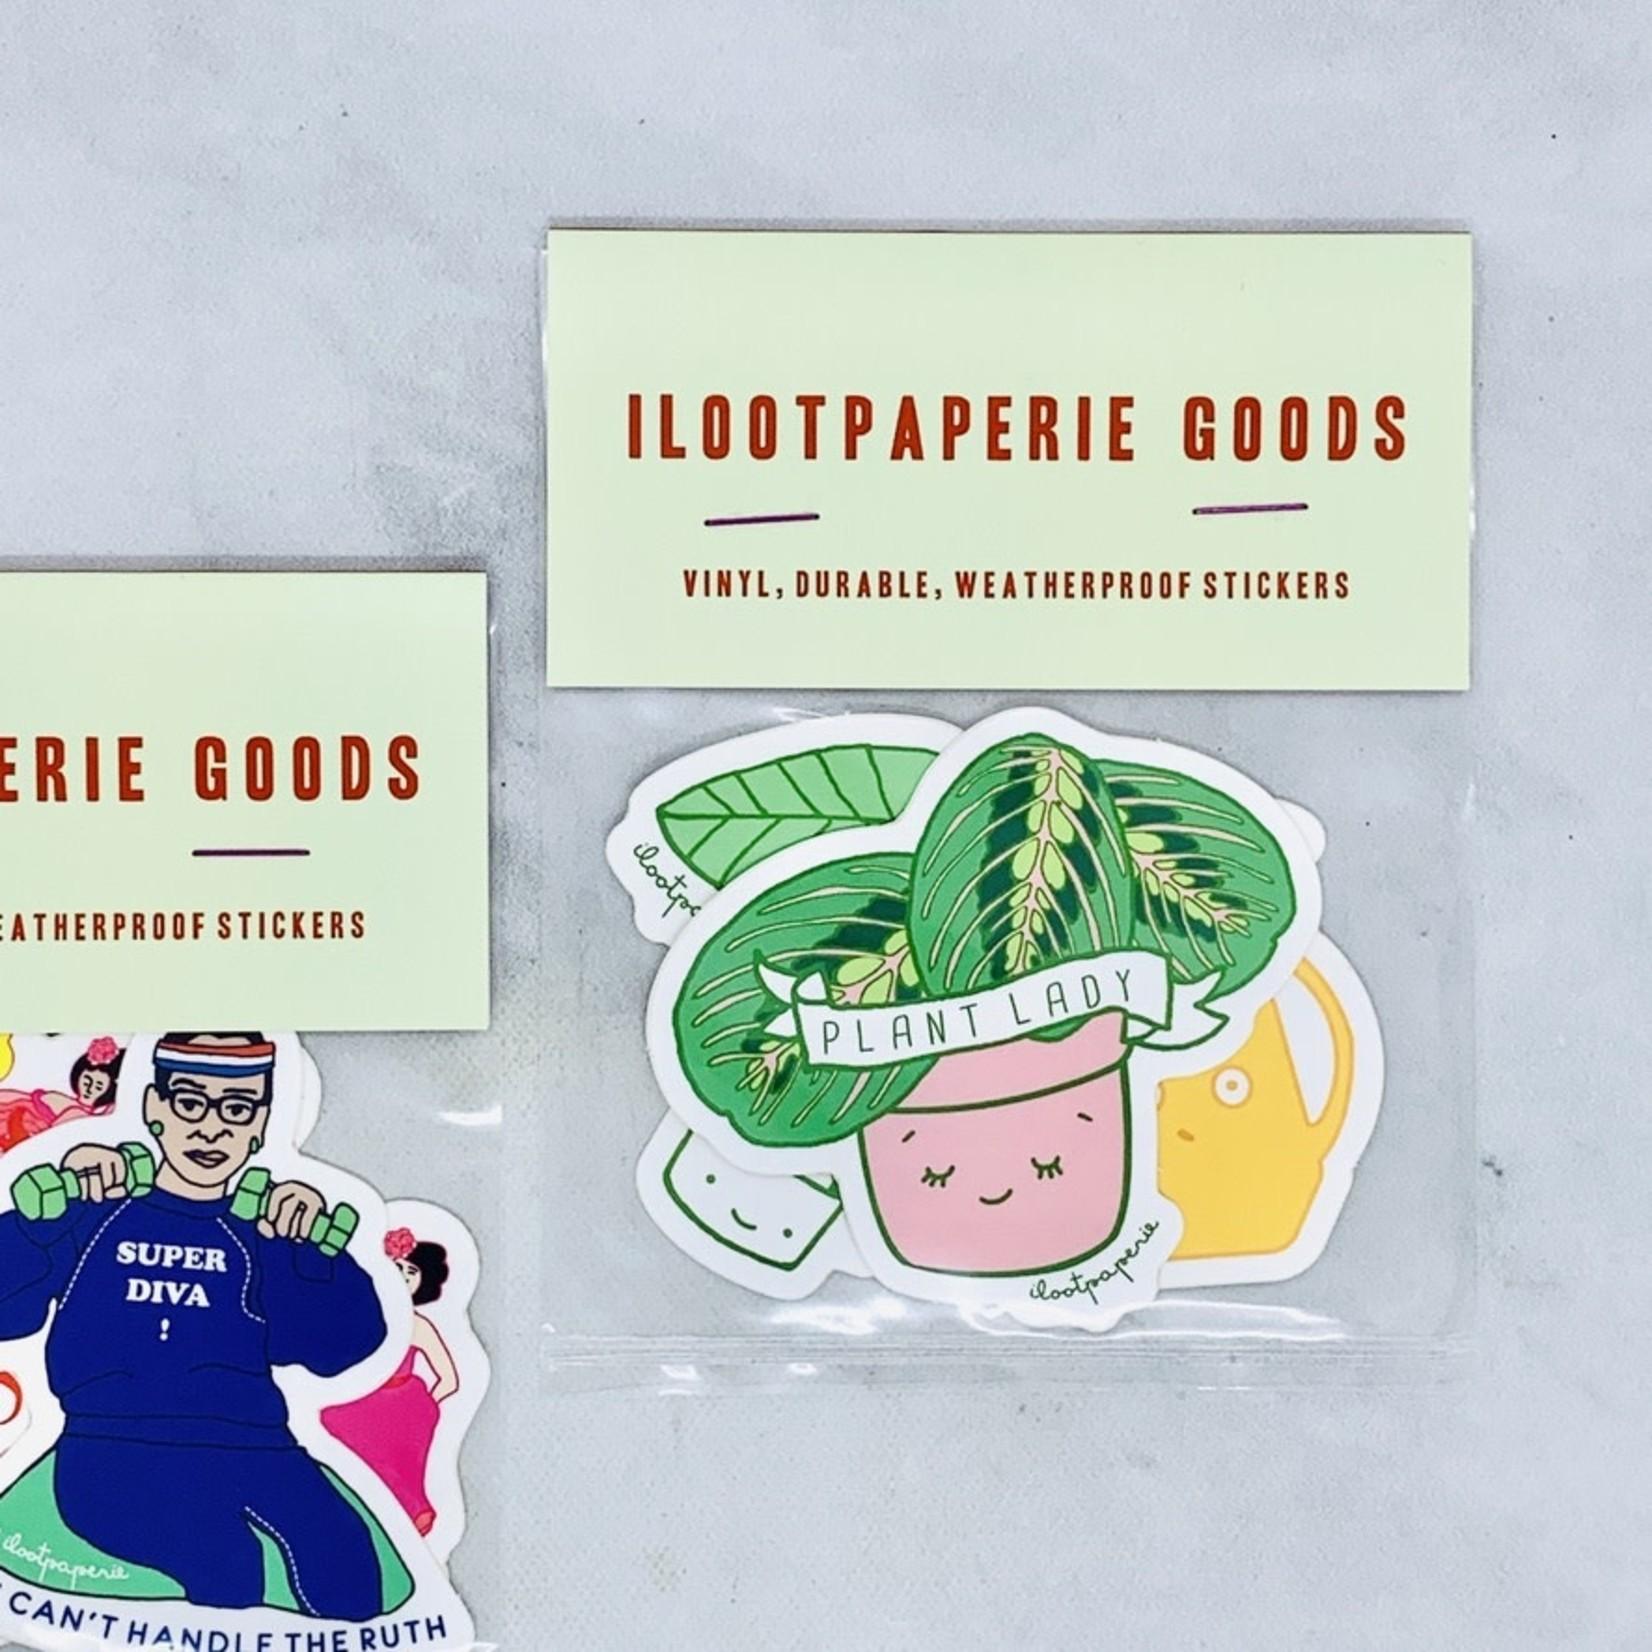 ILOOTPAPERIE Plant Lady Sticker 3 Pack